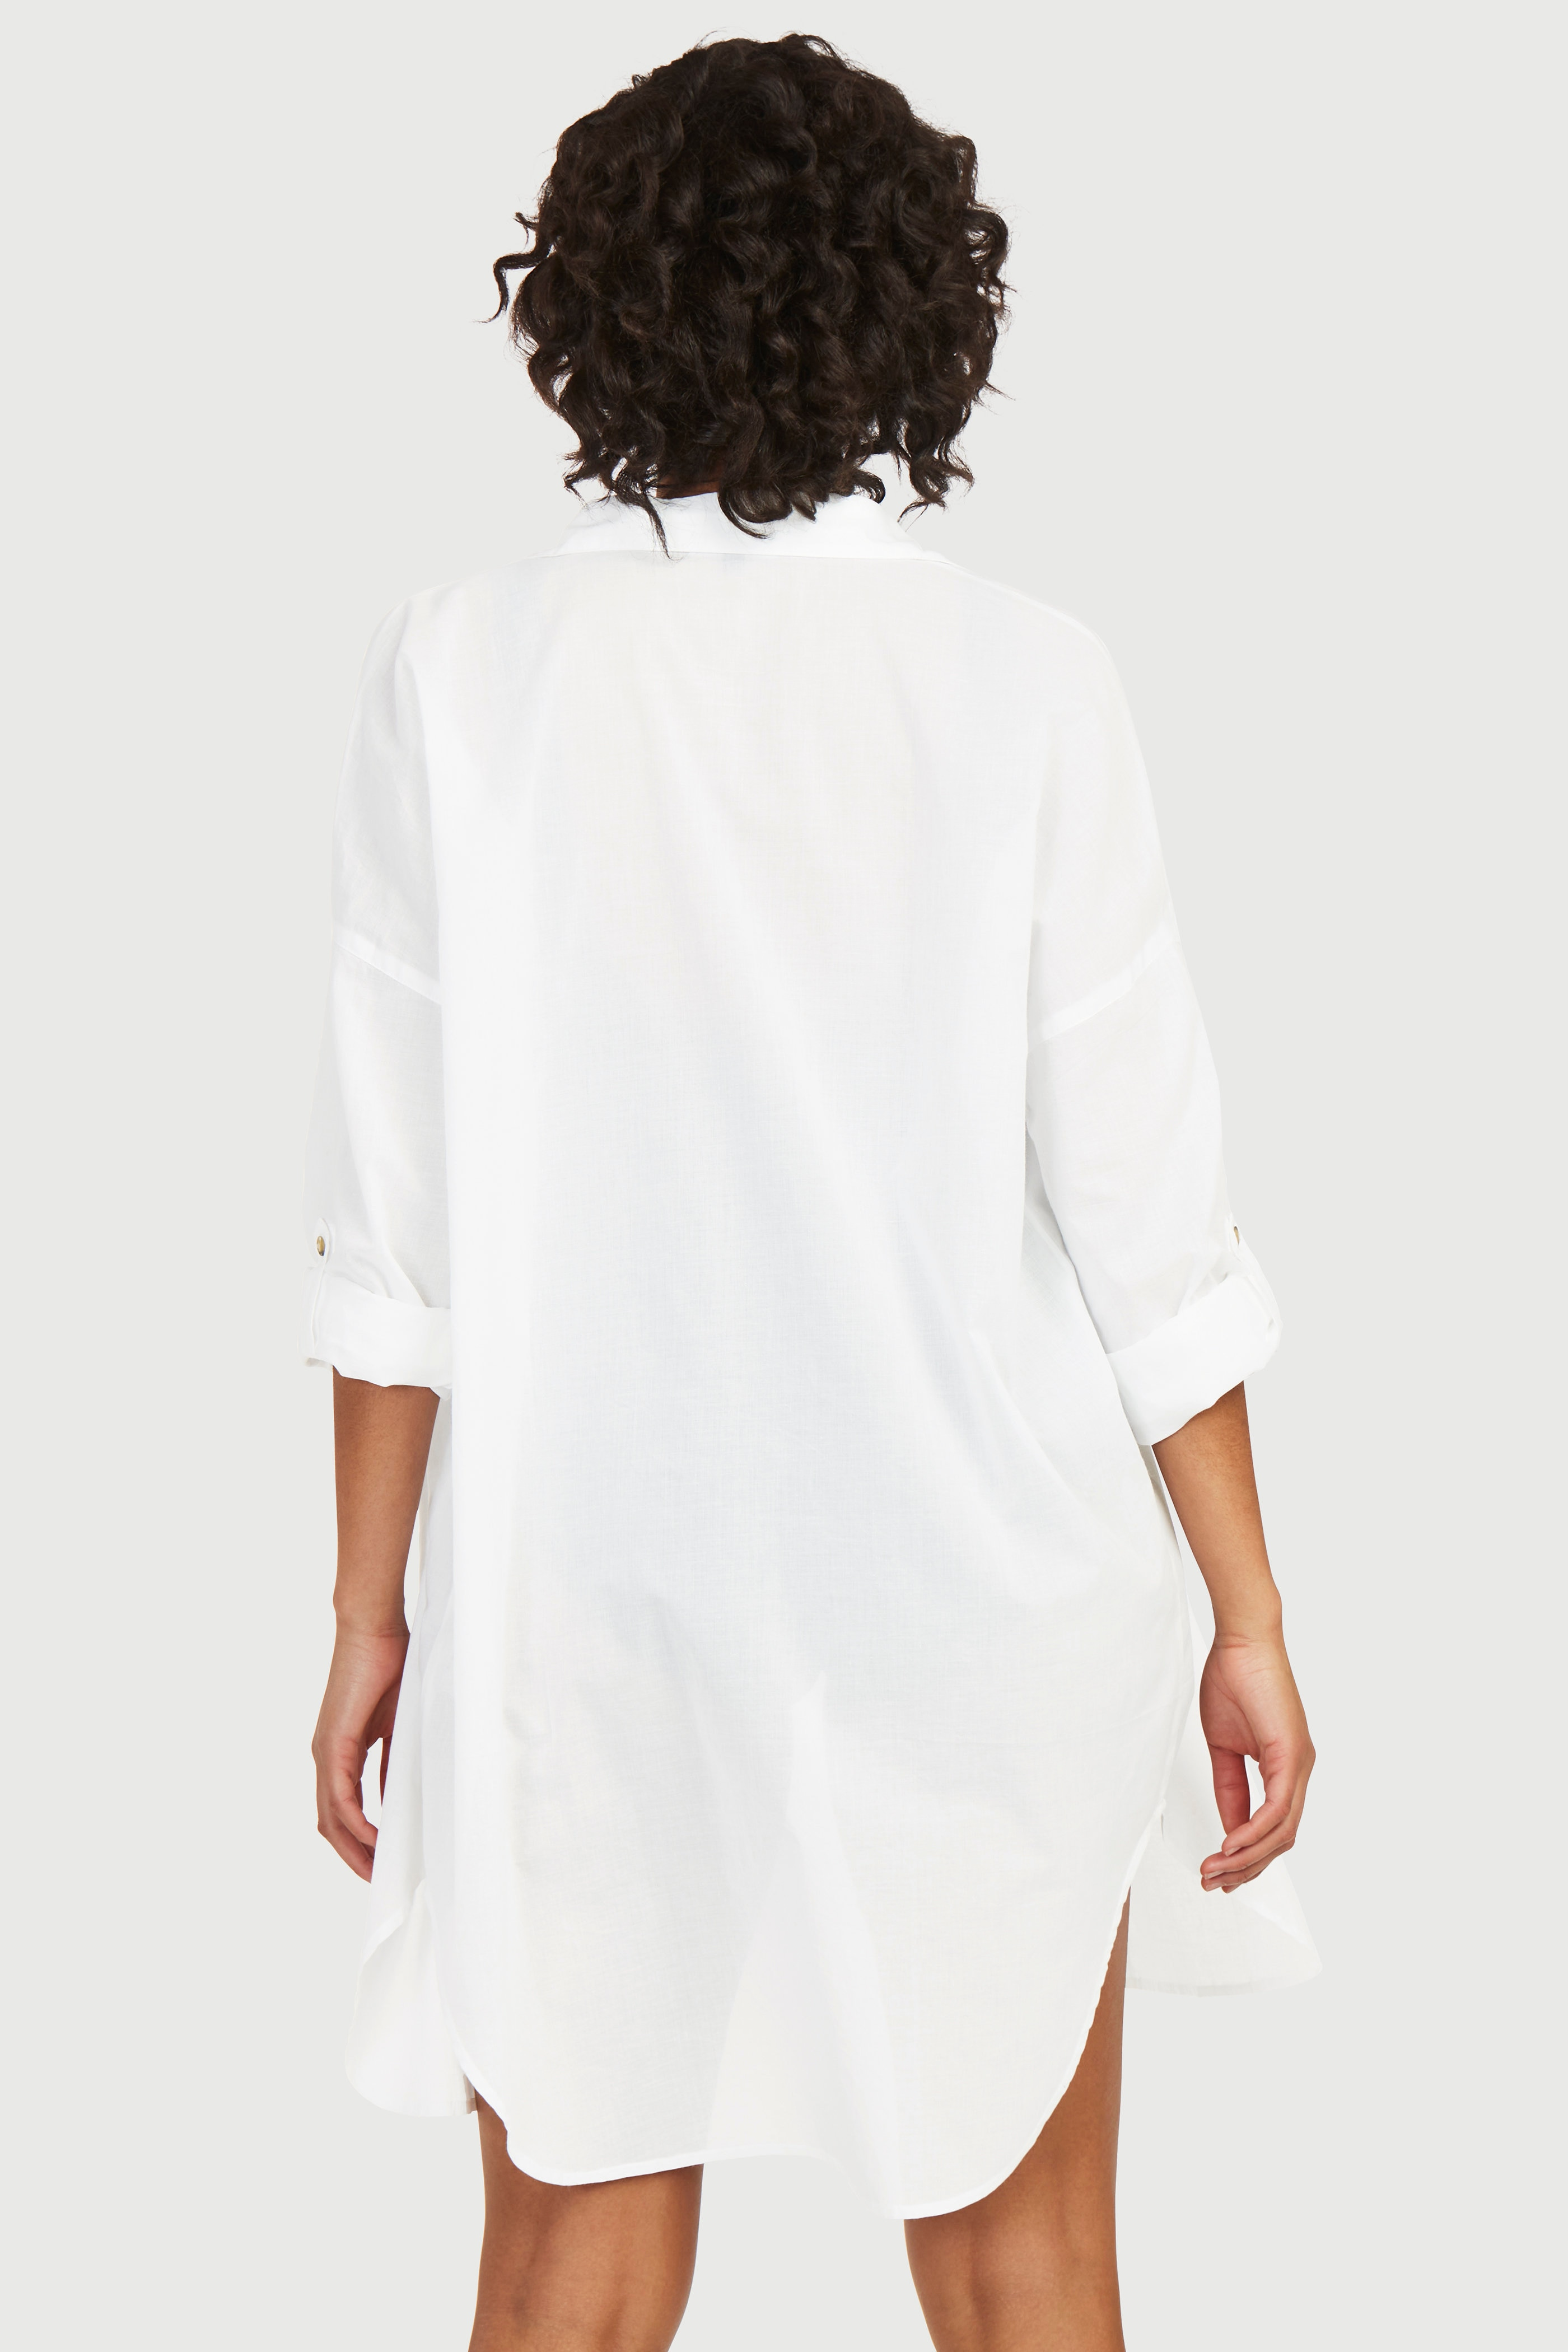 Cienka koszula plażowa